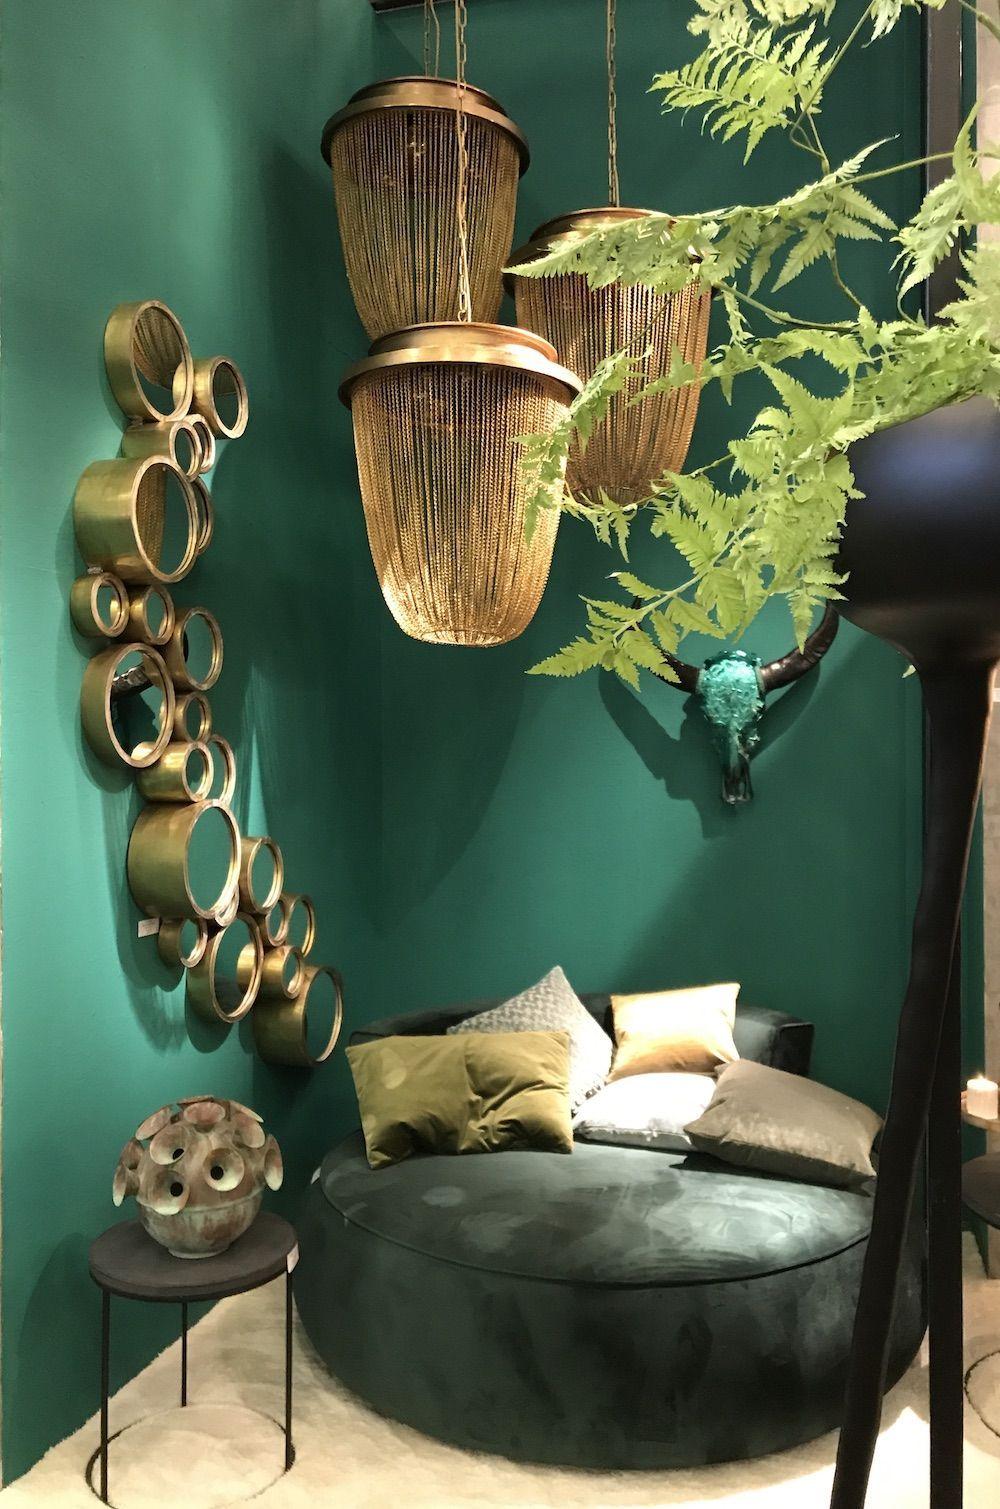 Touch Of Gold Gold Accessoires Goud Messing Interieur Interior Groen Chic Groen Interieur Decoraties Kamer Decoratie